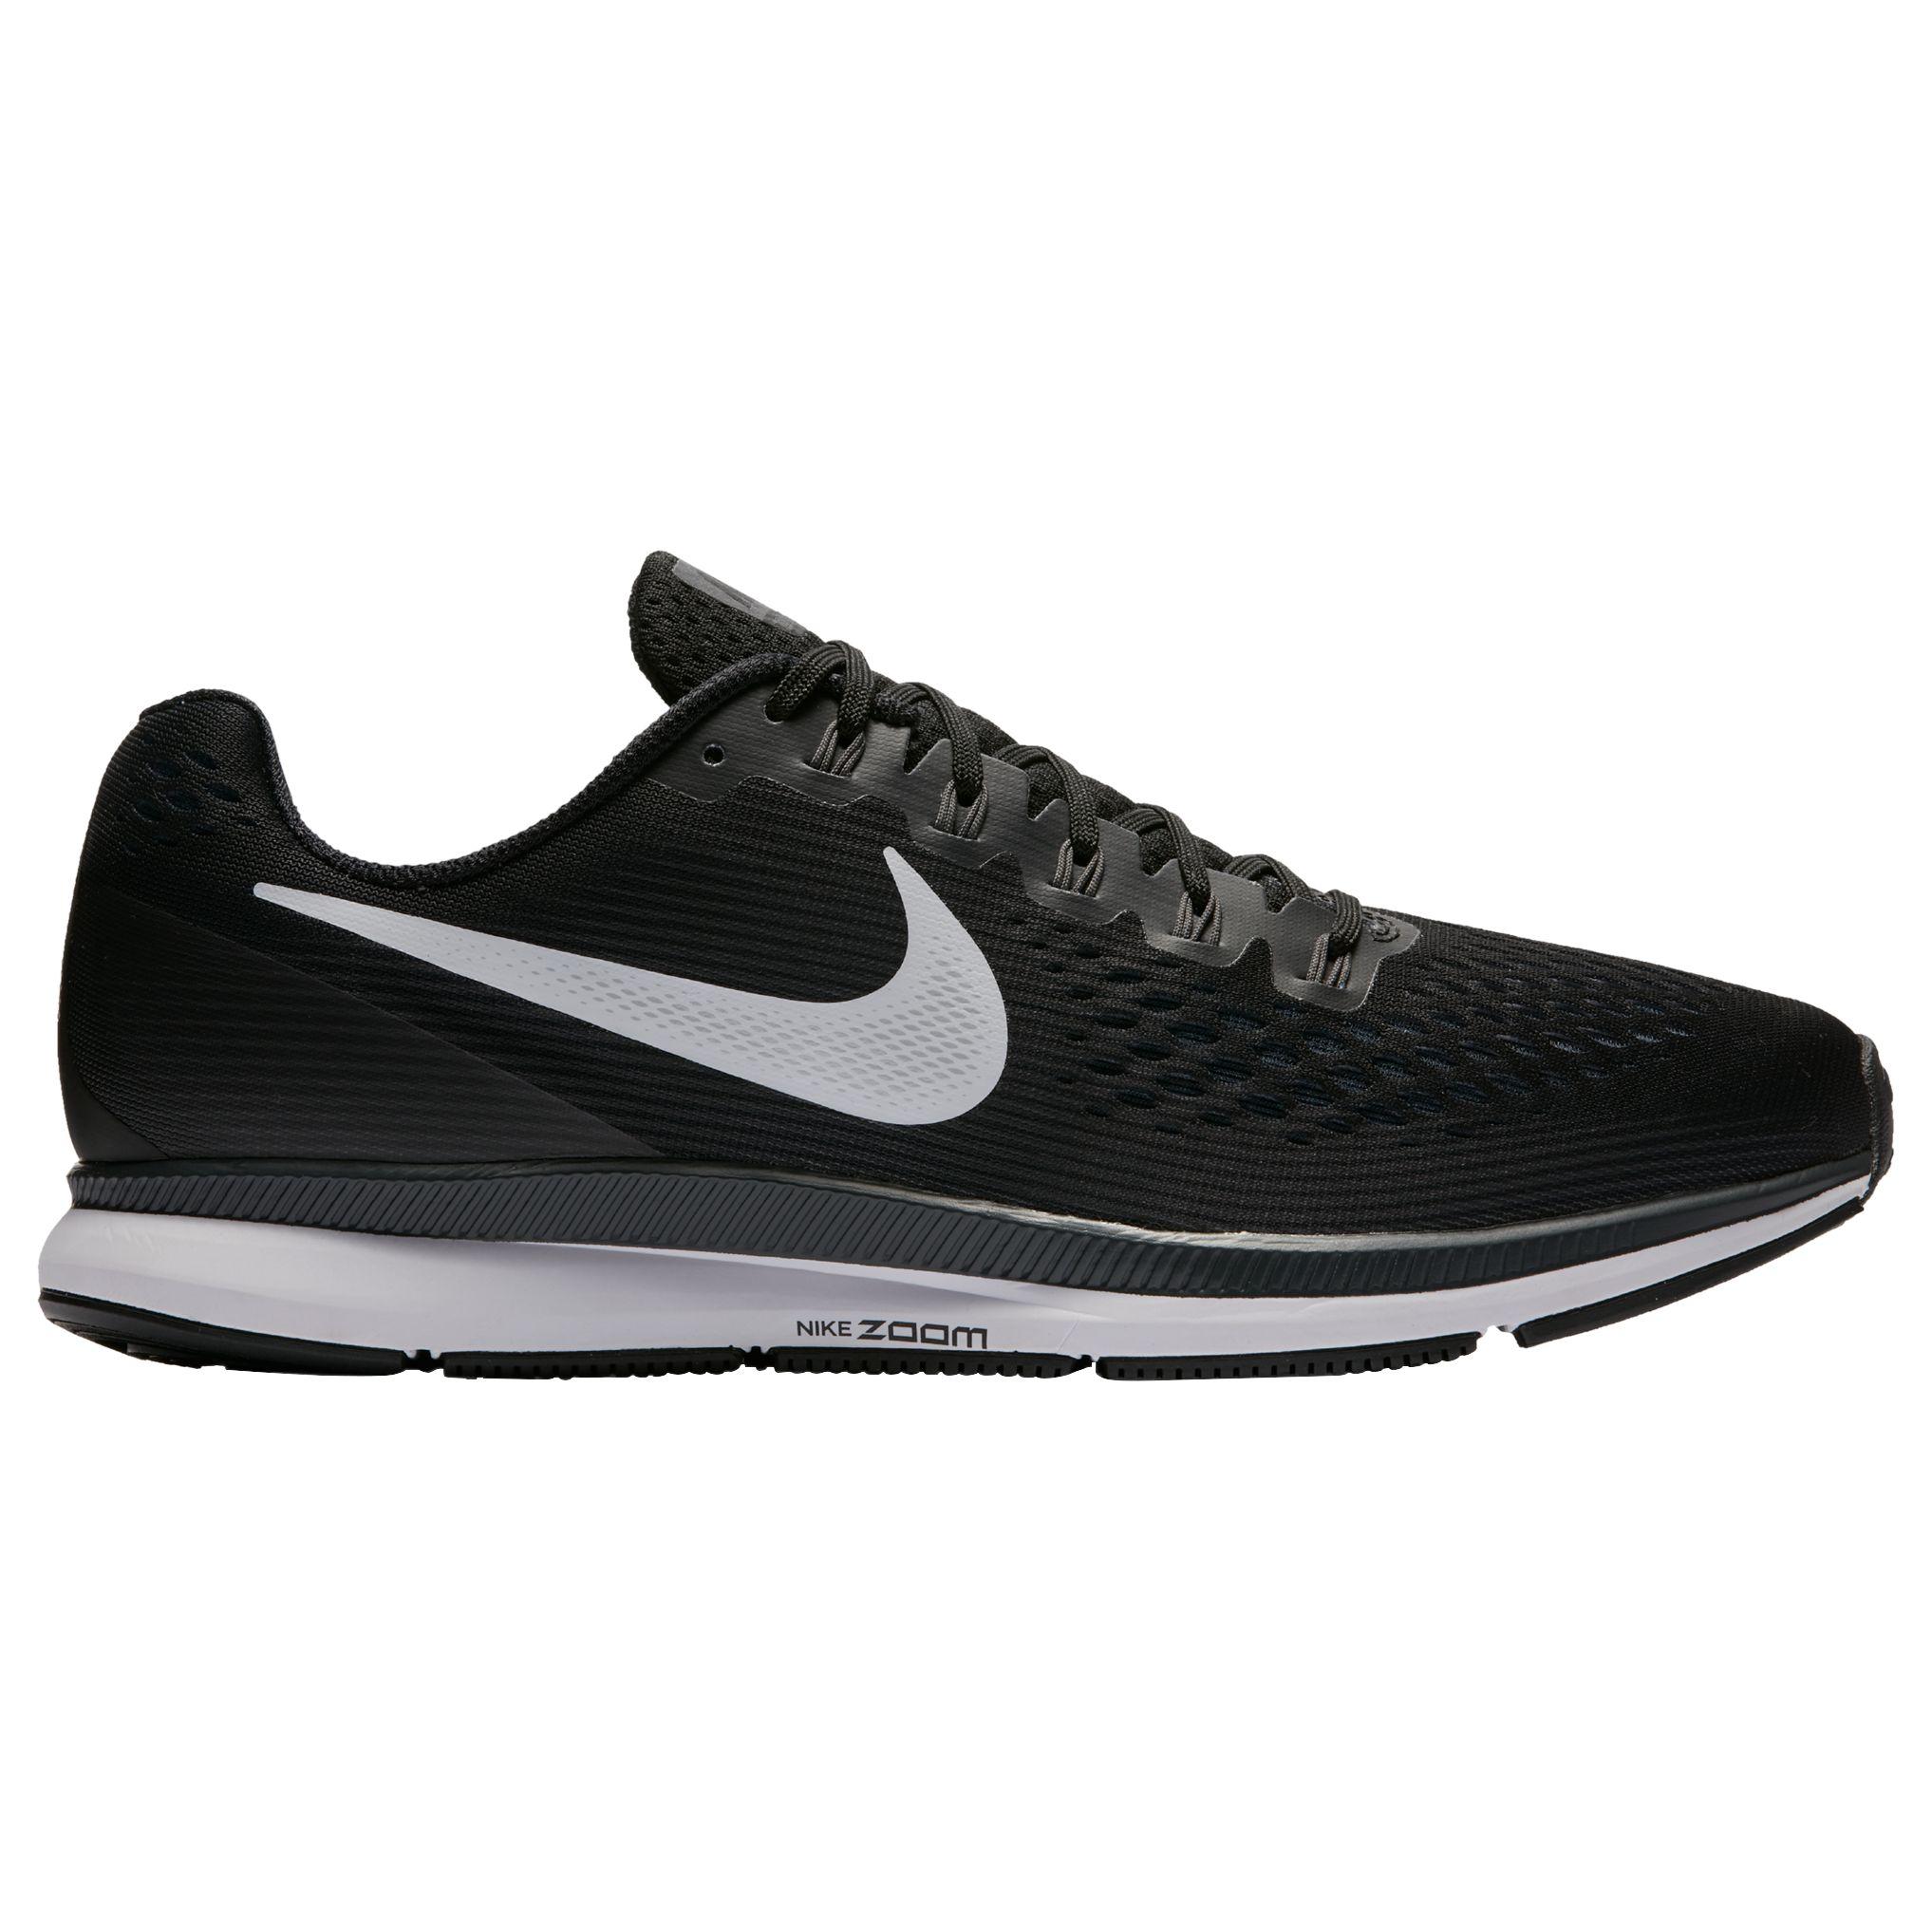 909a72b09af9 Nike Air Zoom Pegasus 34 Men s Running Shoes